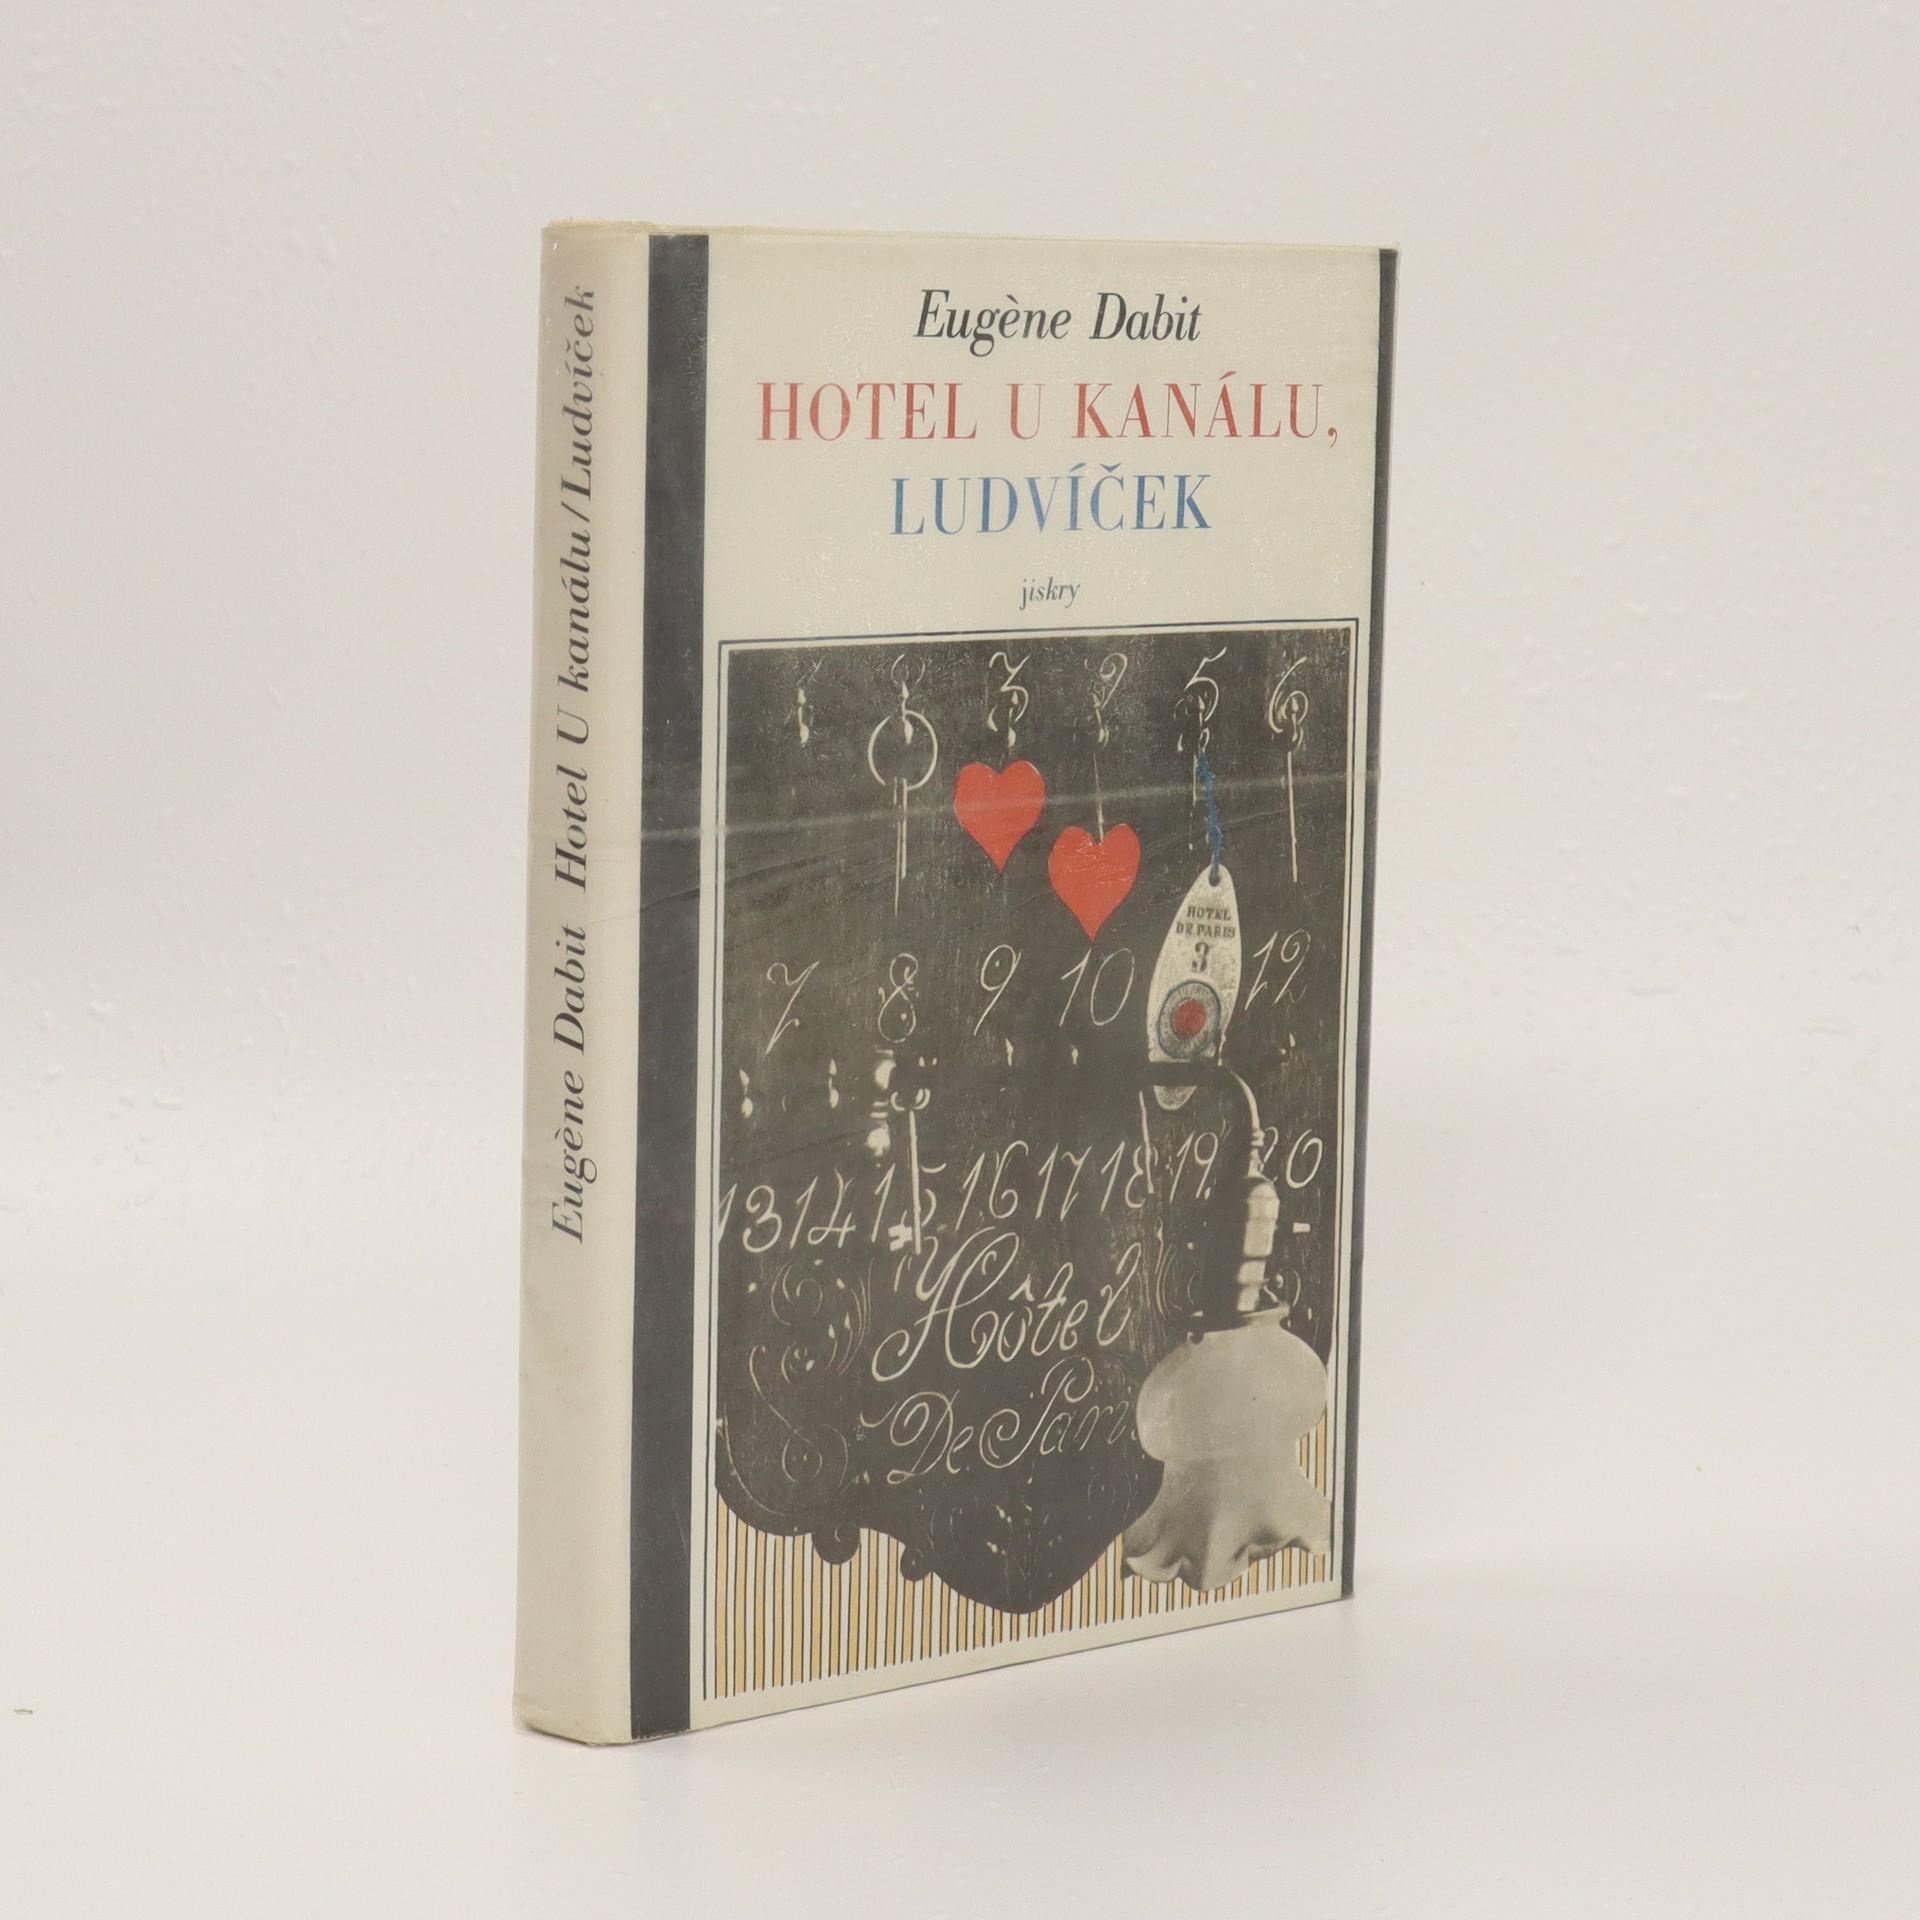 antikvární kniha Hotel u kanálu, Ludvíček, 1981